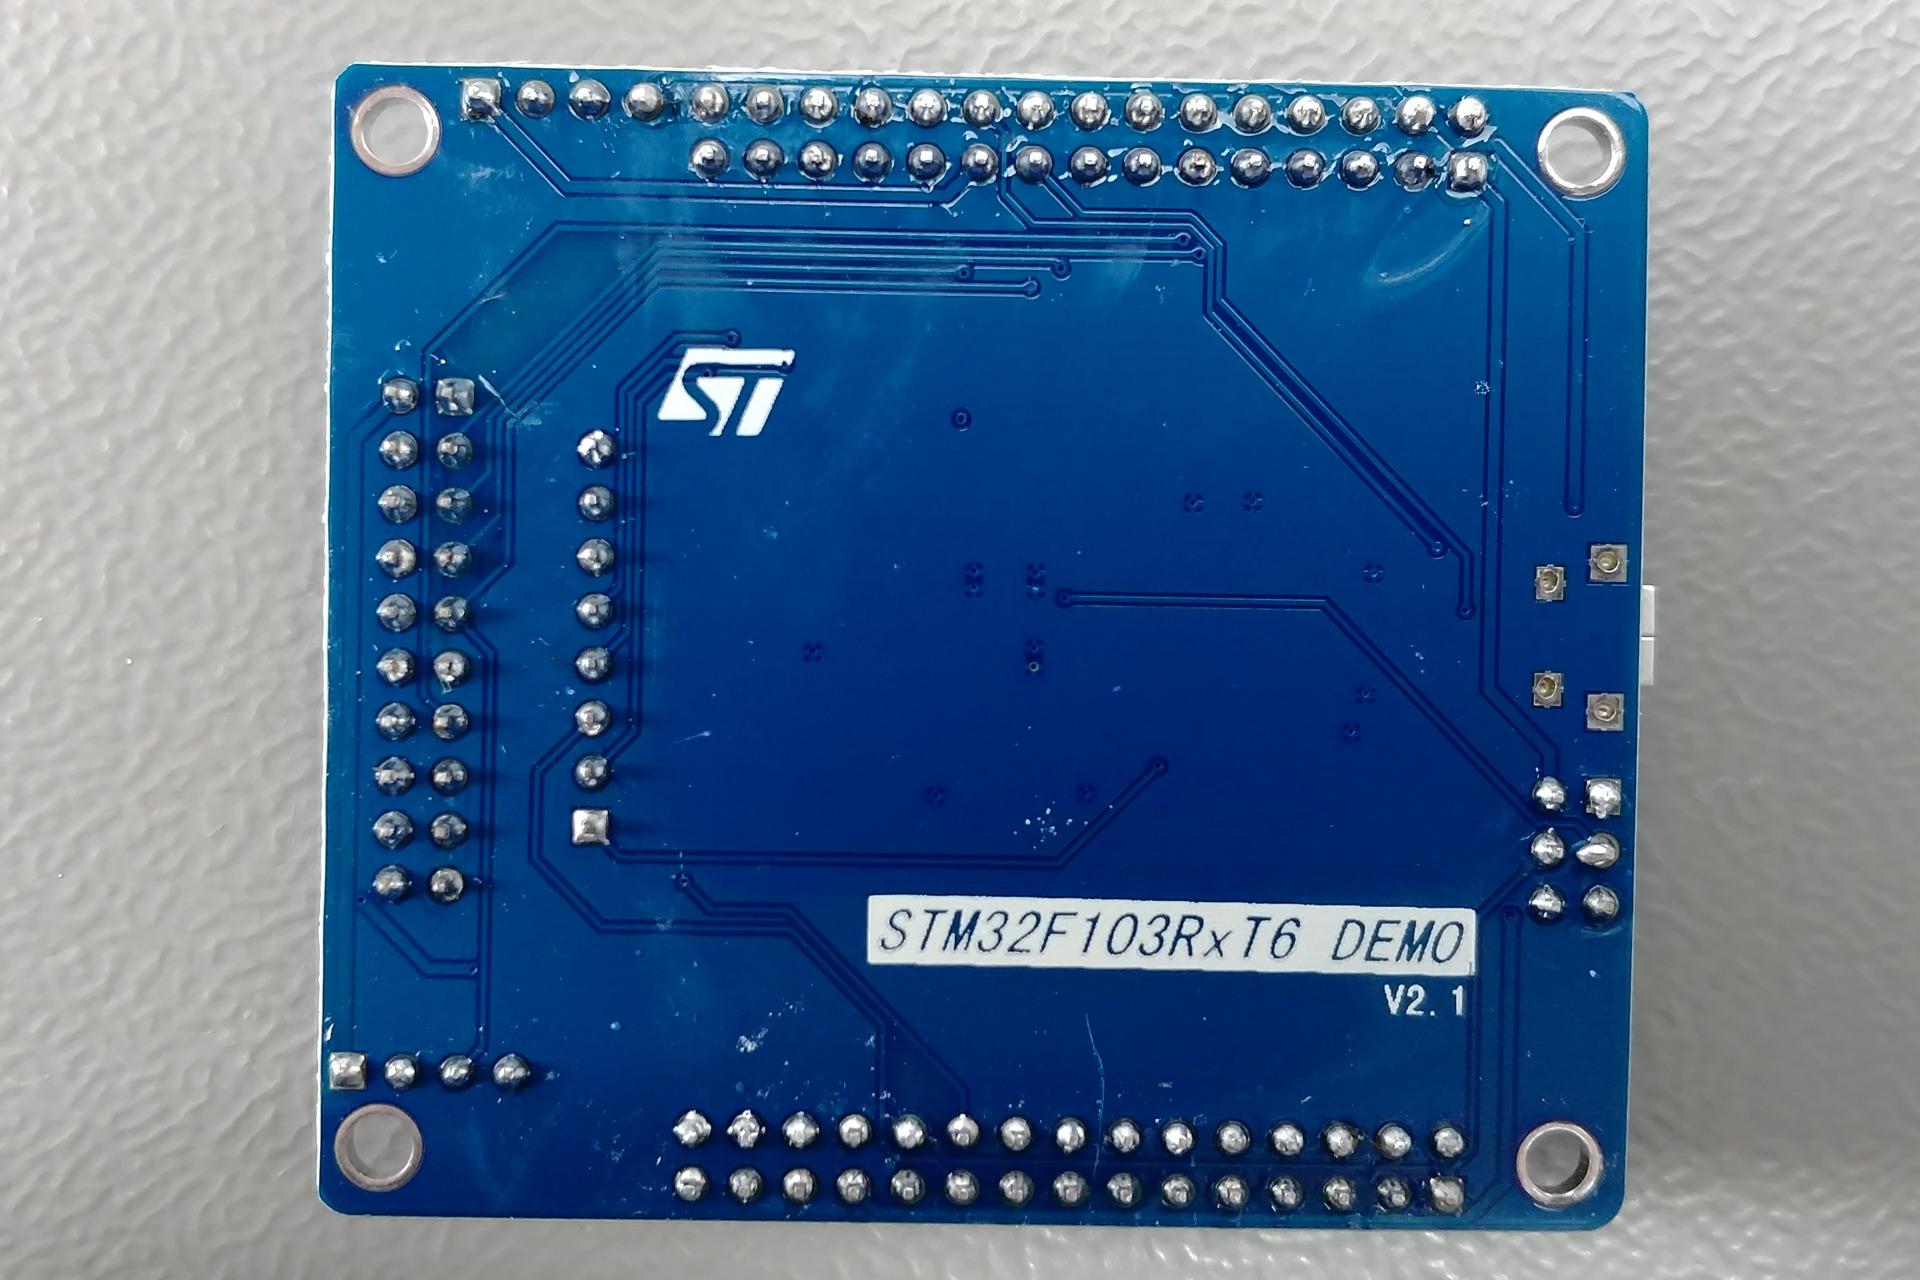 STM32F103RBT6 - STM32F103RxT6 DEMO Bottom view